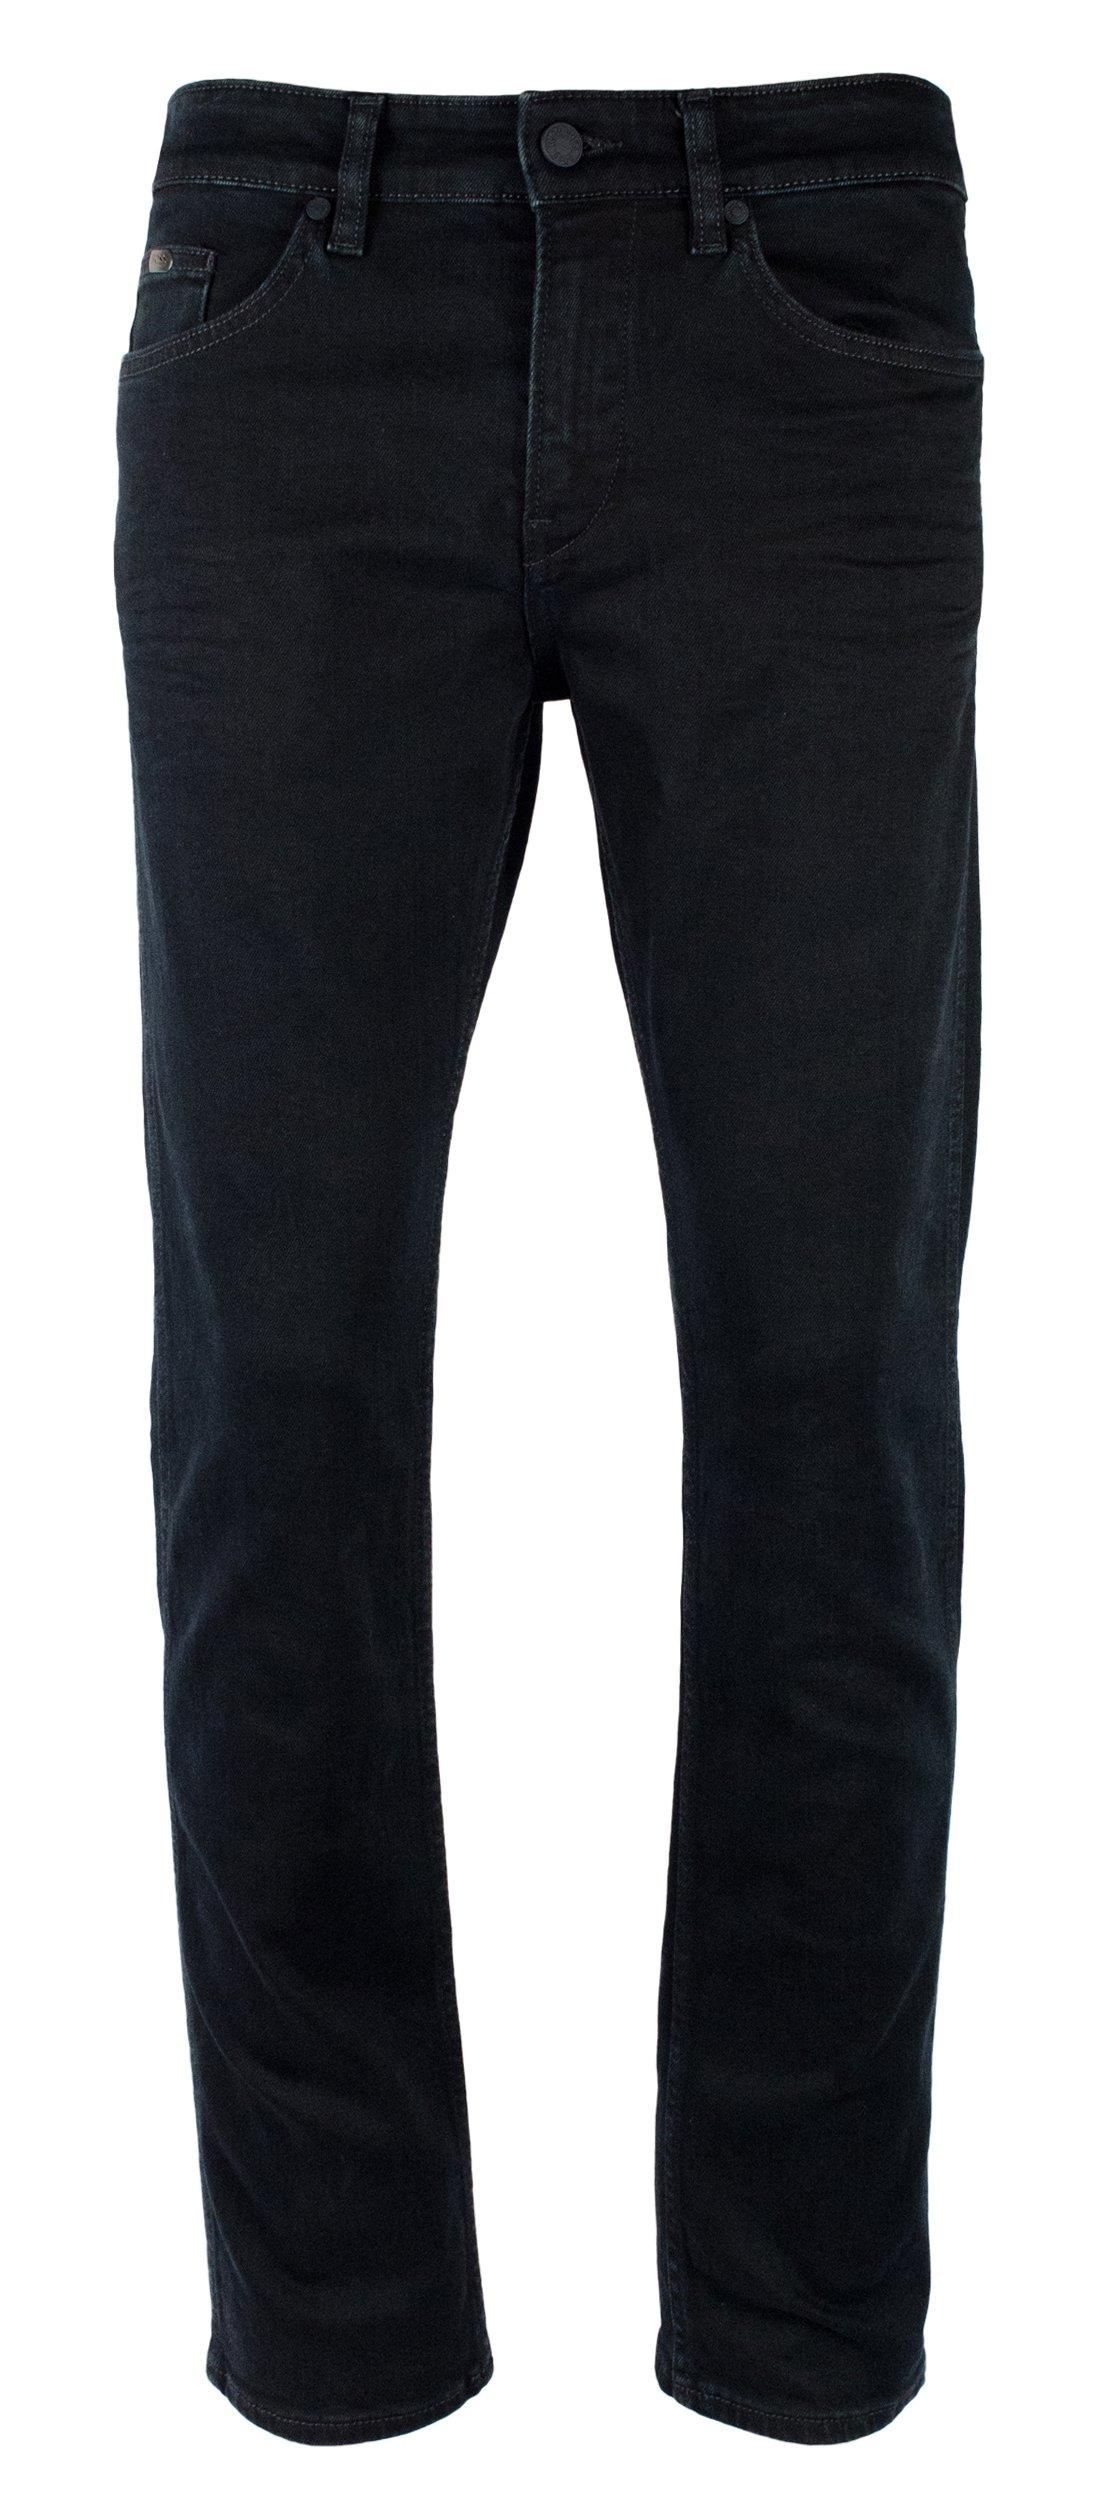 Hugo Boss Men's Delaware Green Label Stretch Slim Fit Jeans-B-36Wx32L by HUGO BOSS